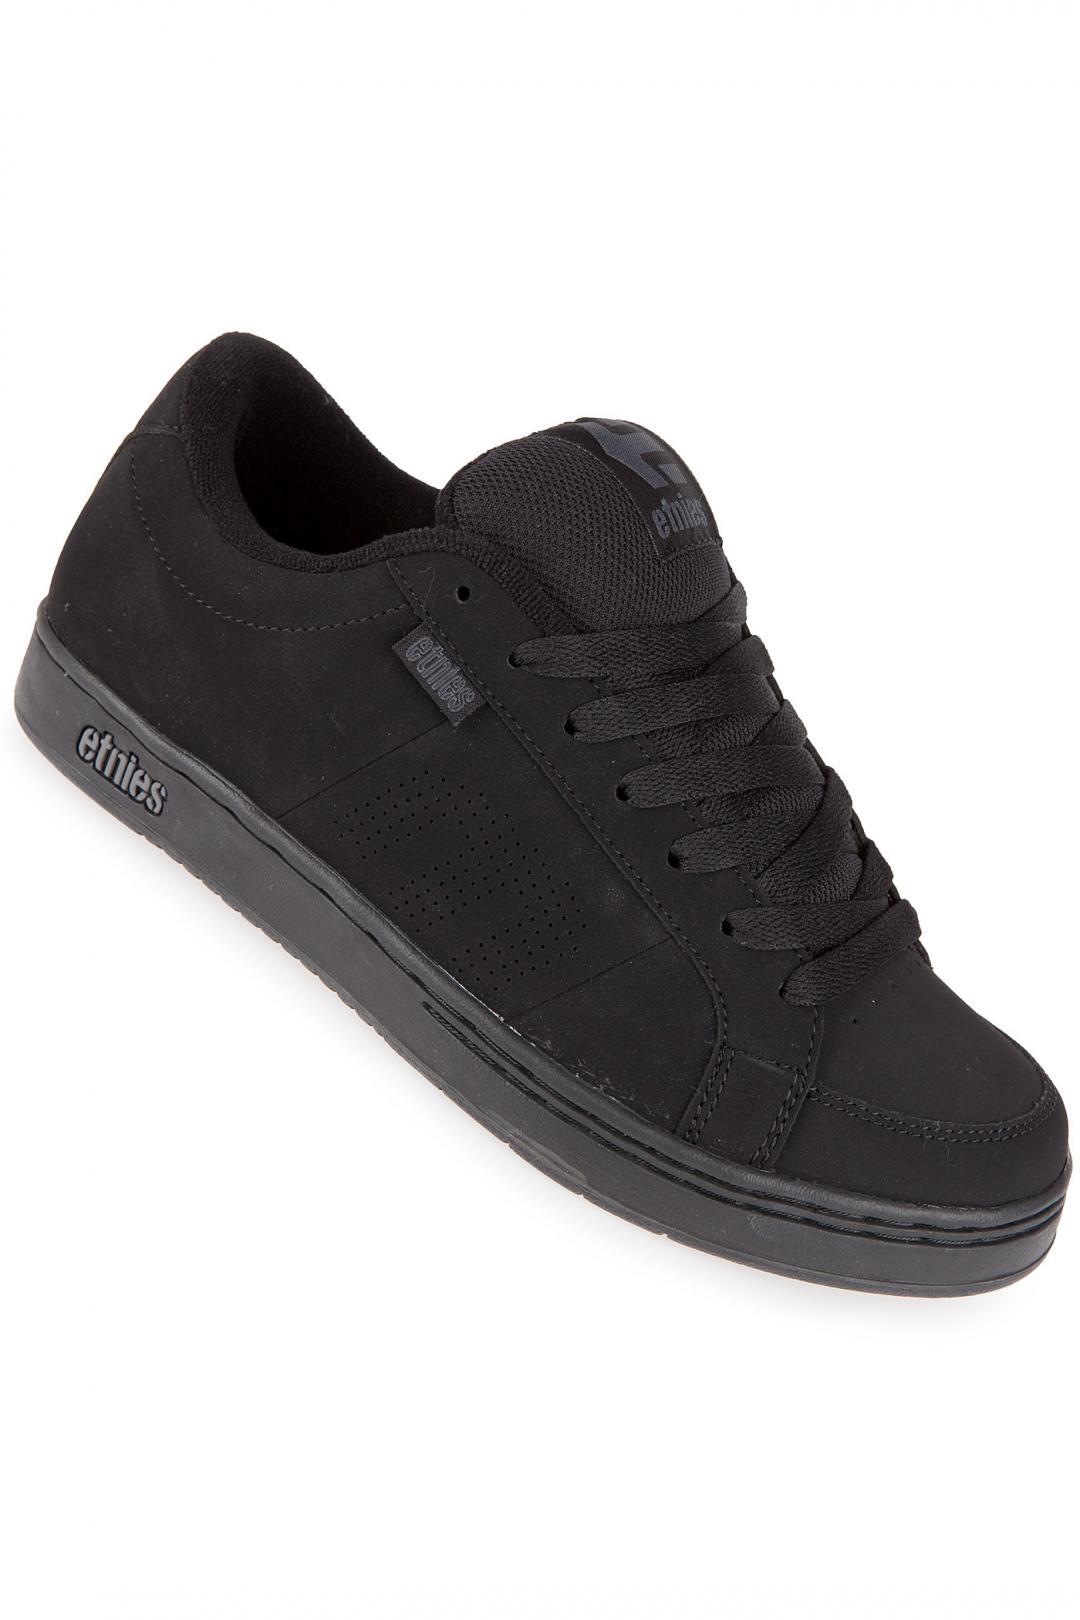 Uomo Etnies Kingpin black black   Sneakers low top